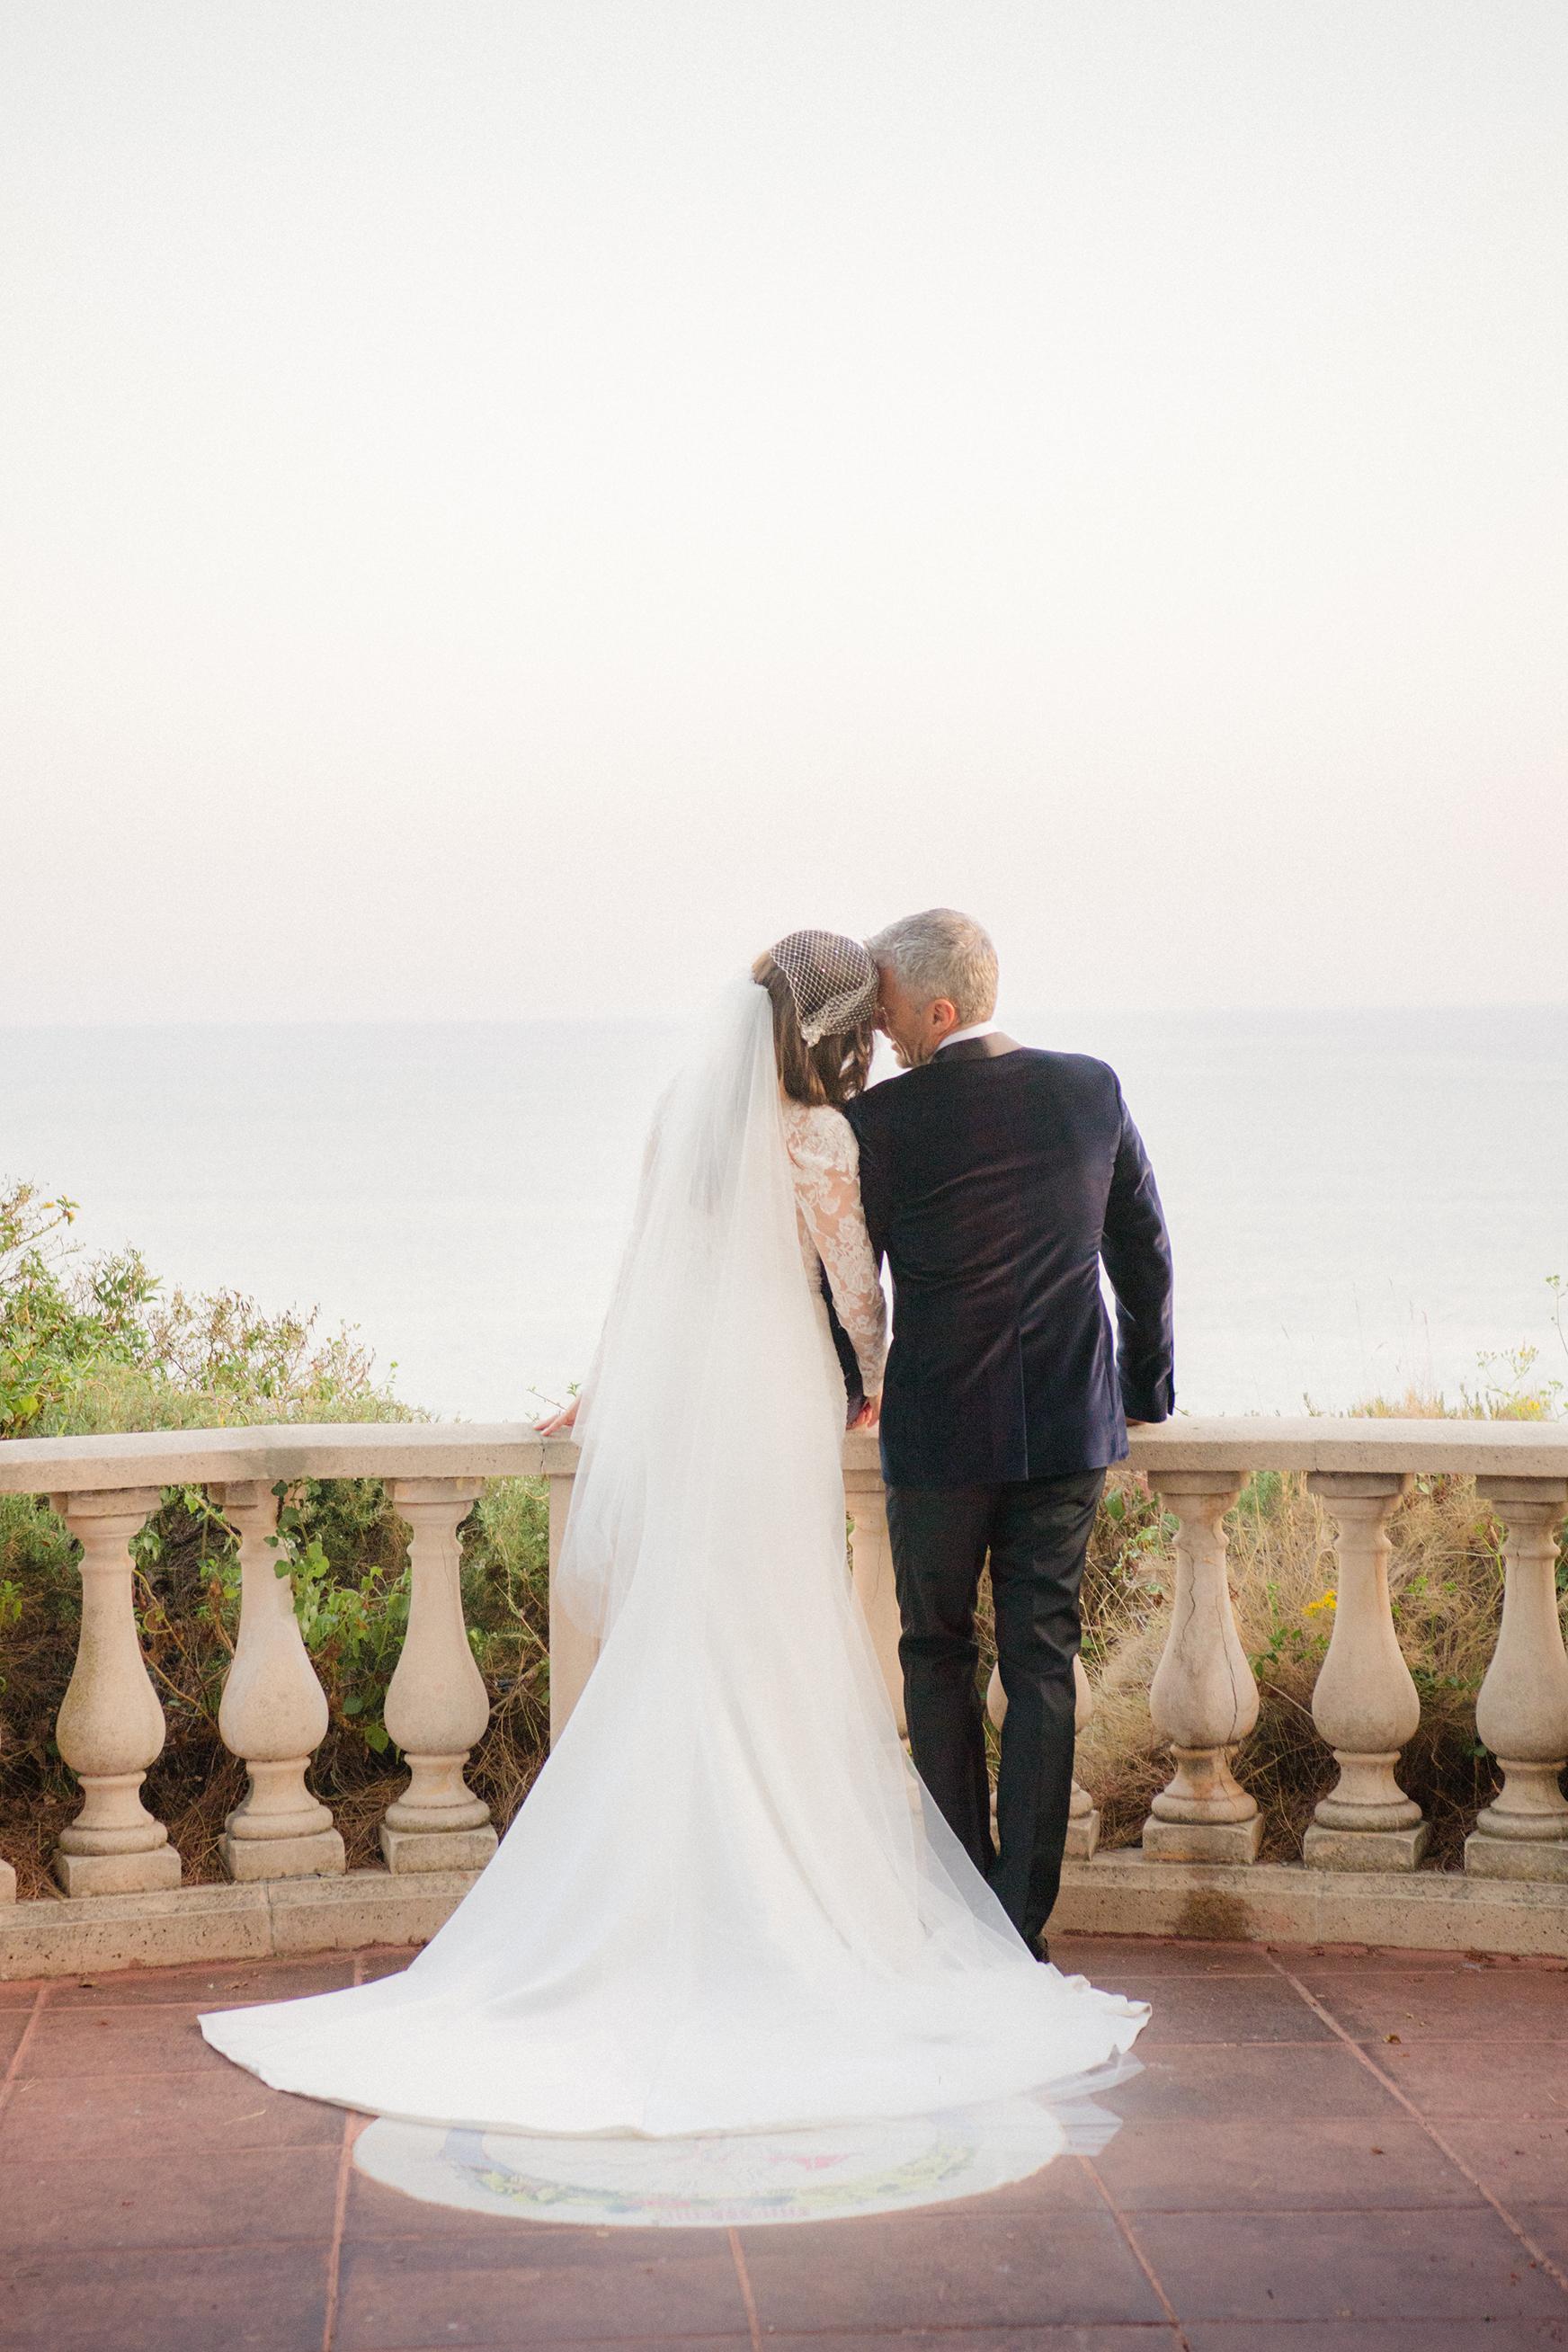 jiannina enzo wedding couple admiring view